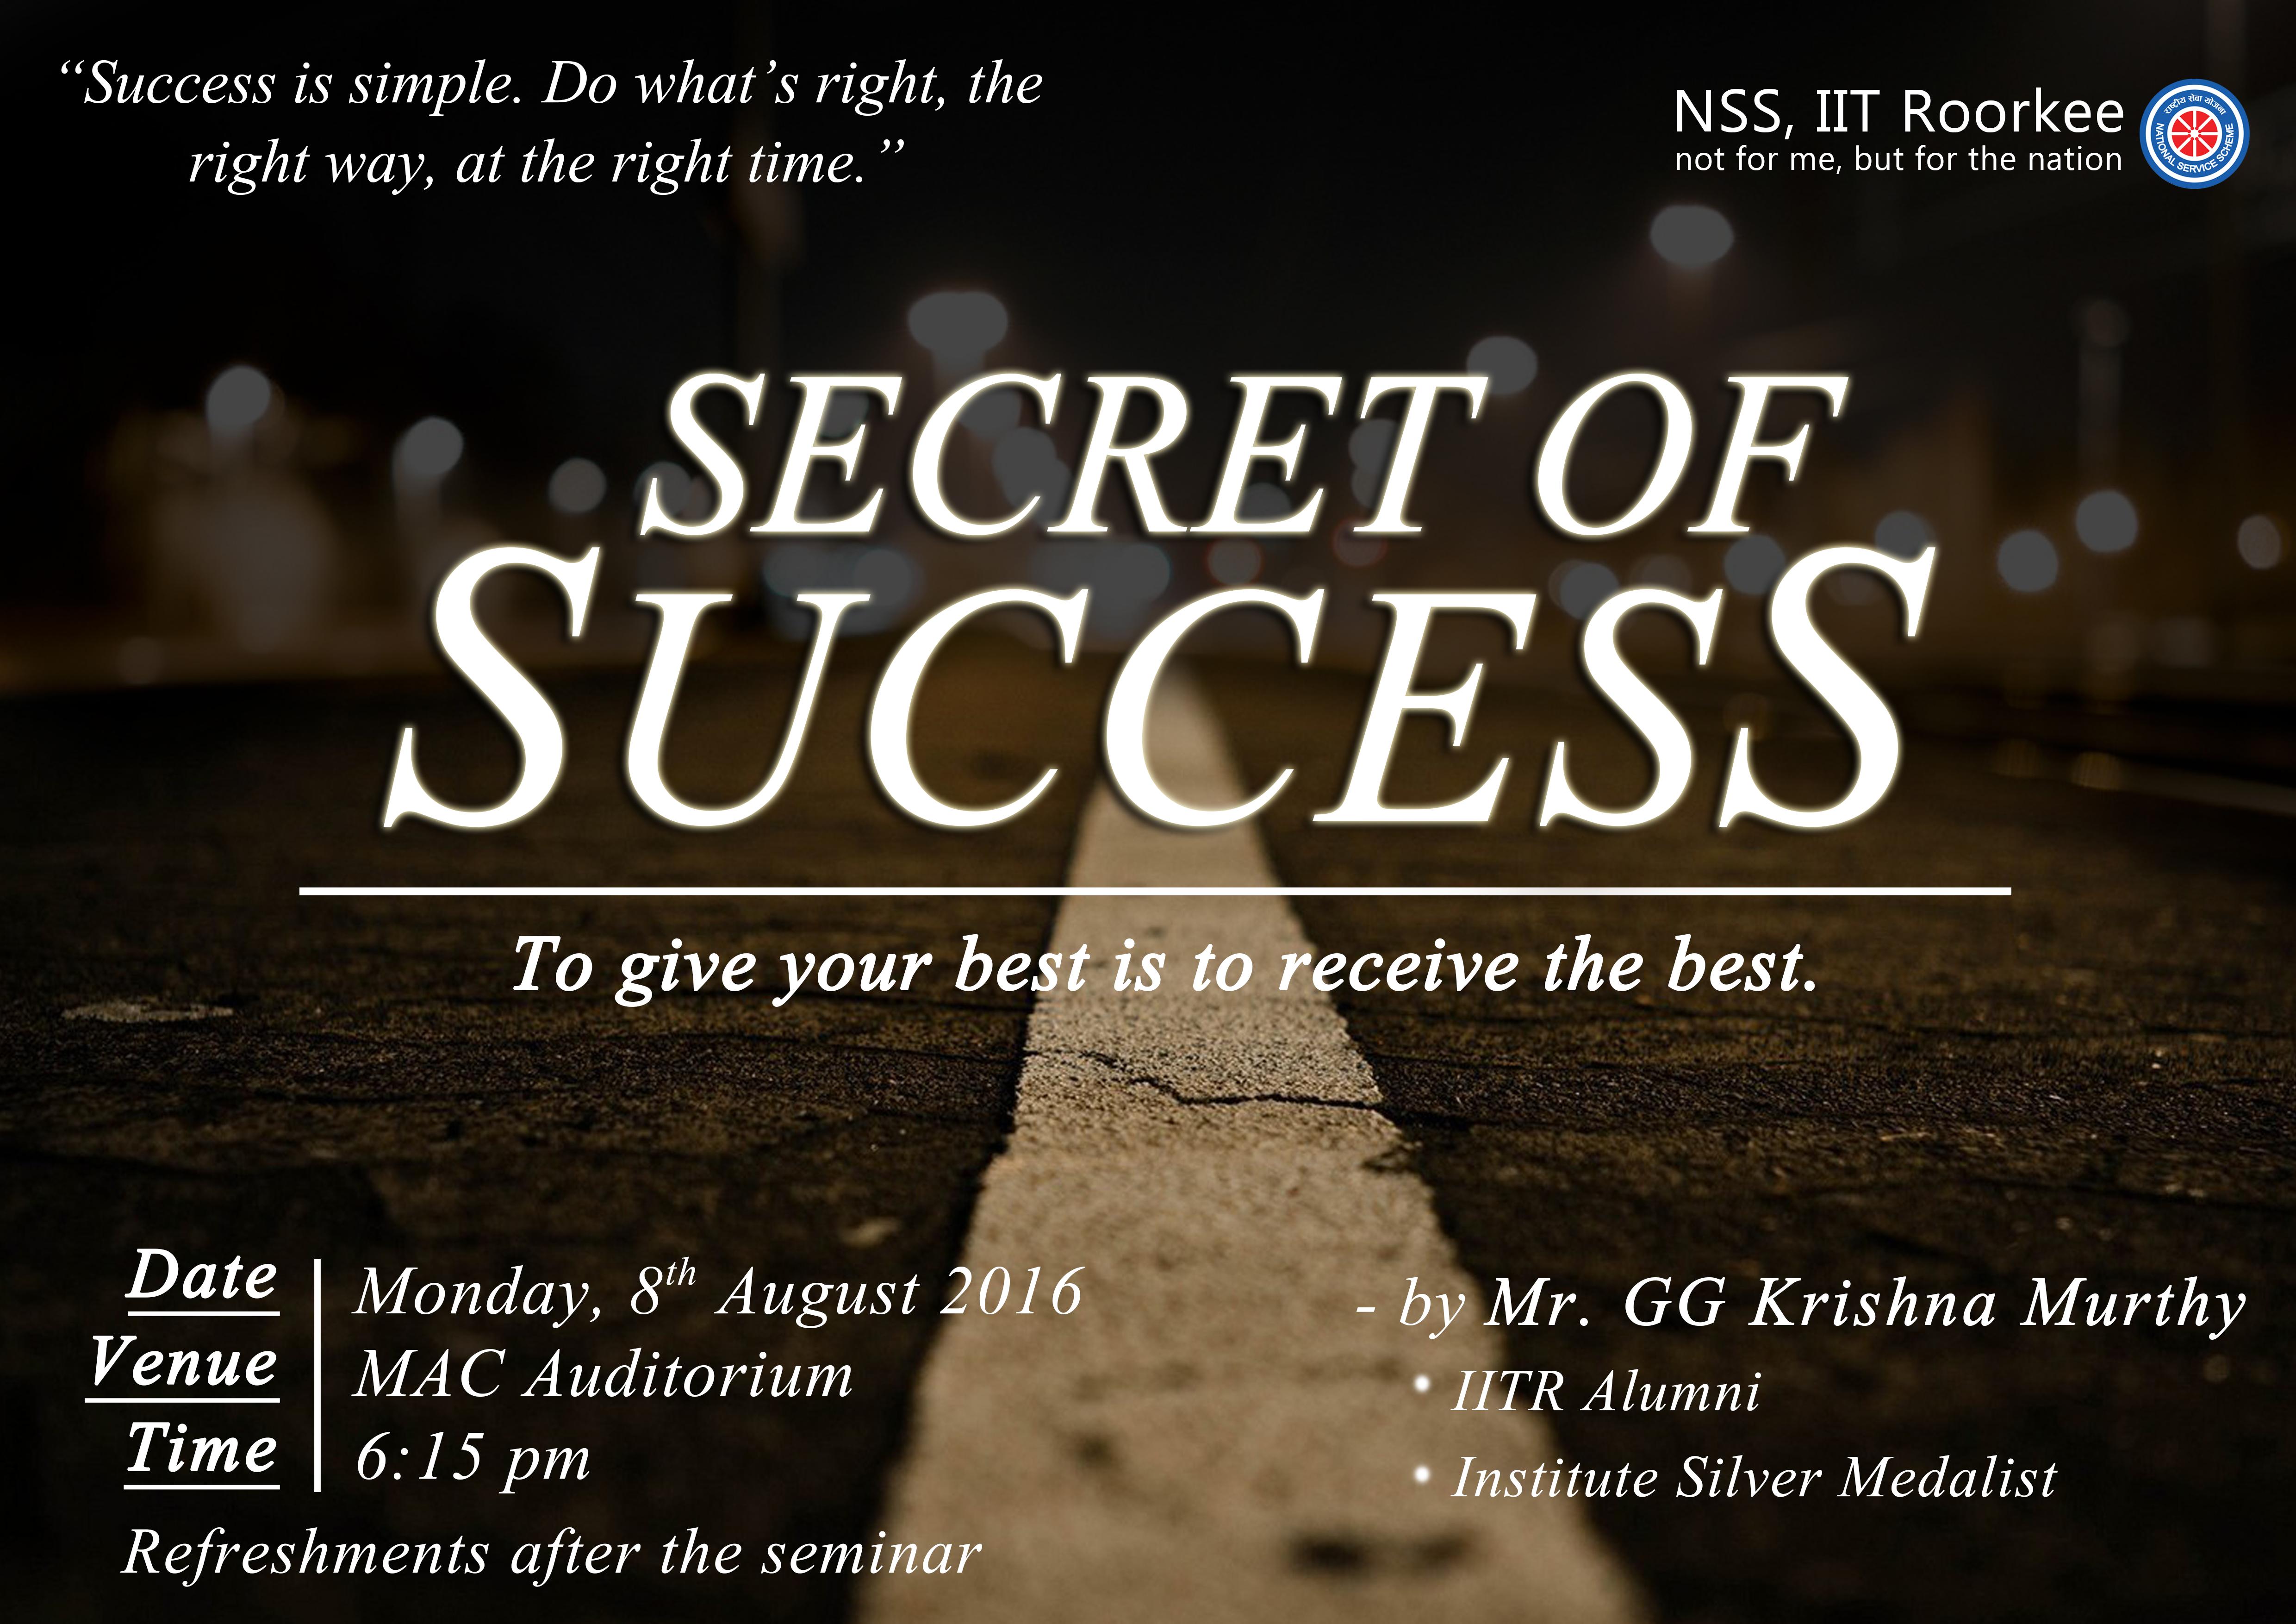 secret-of-success-2